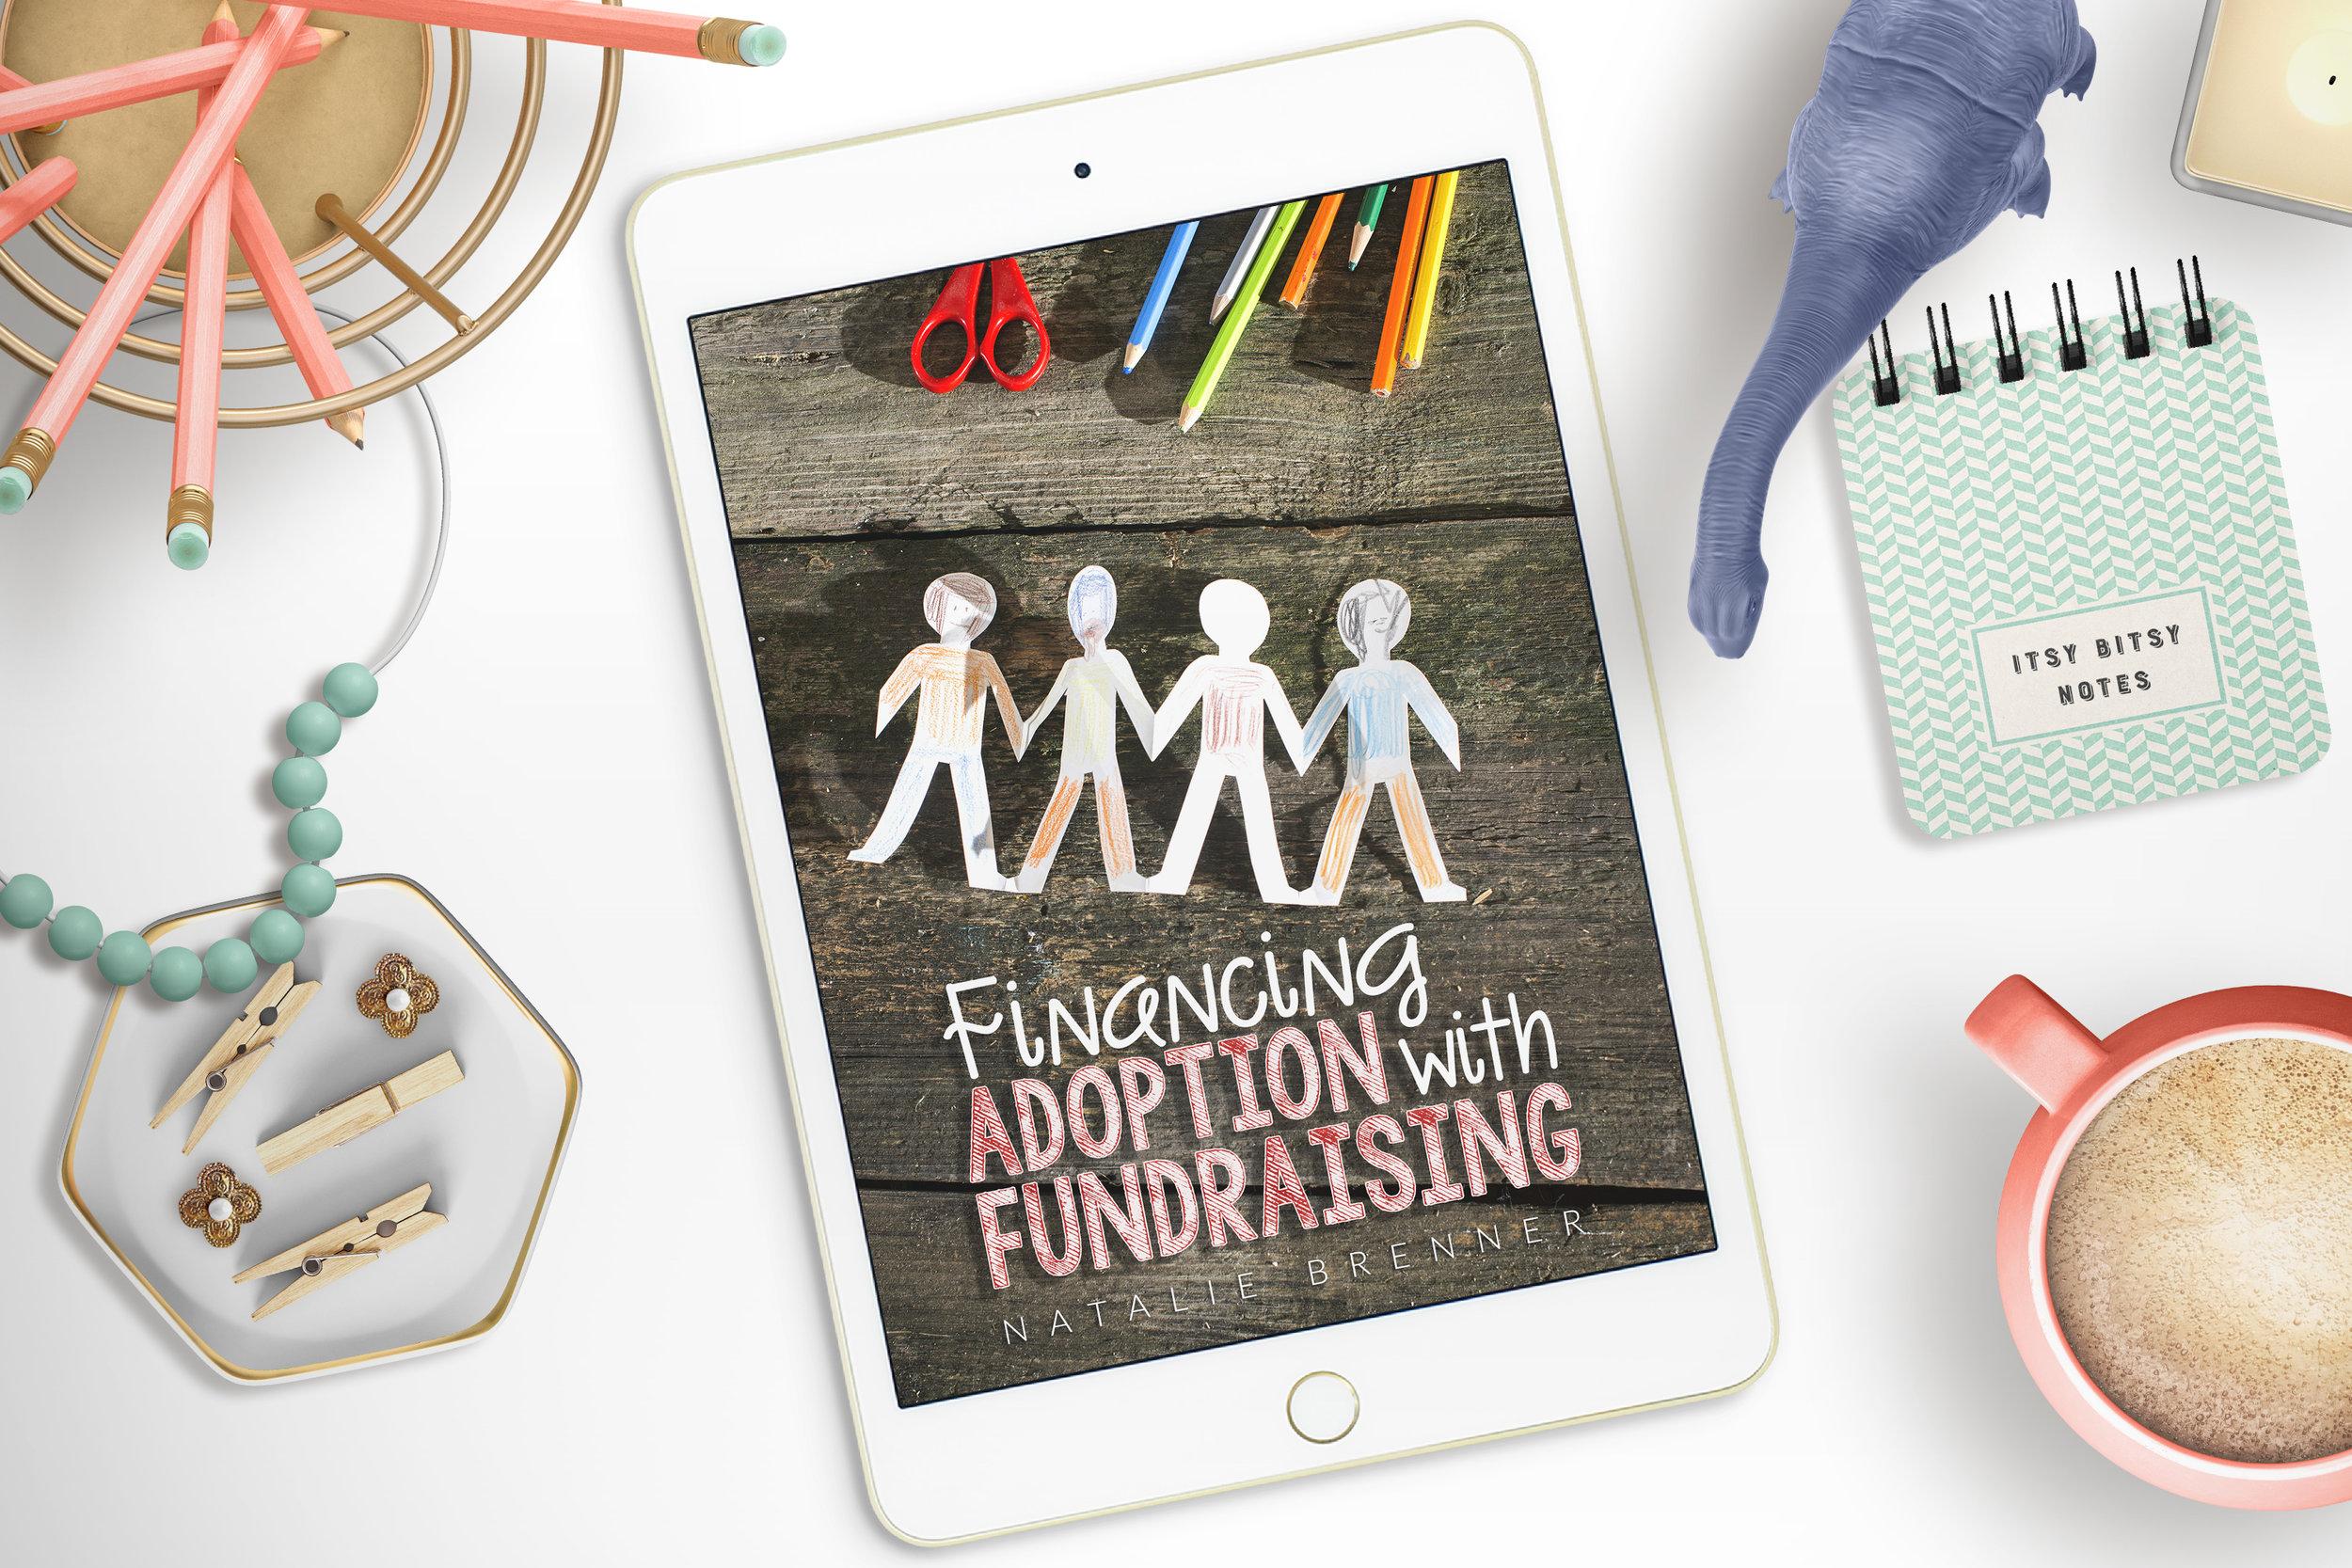 Brenner_FinancingAdoptionWithFundraising_eBookCover_Mockup.jpg